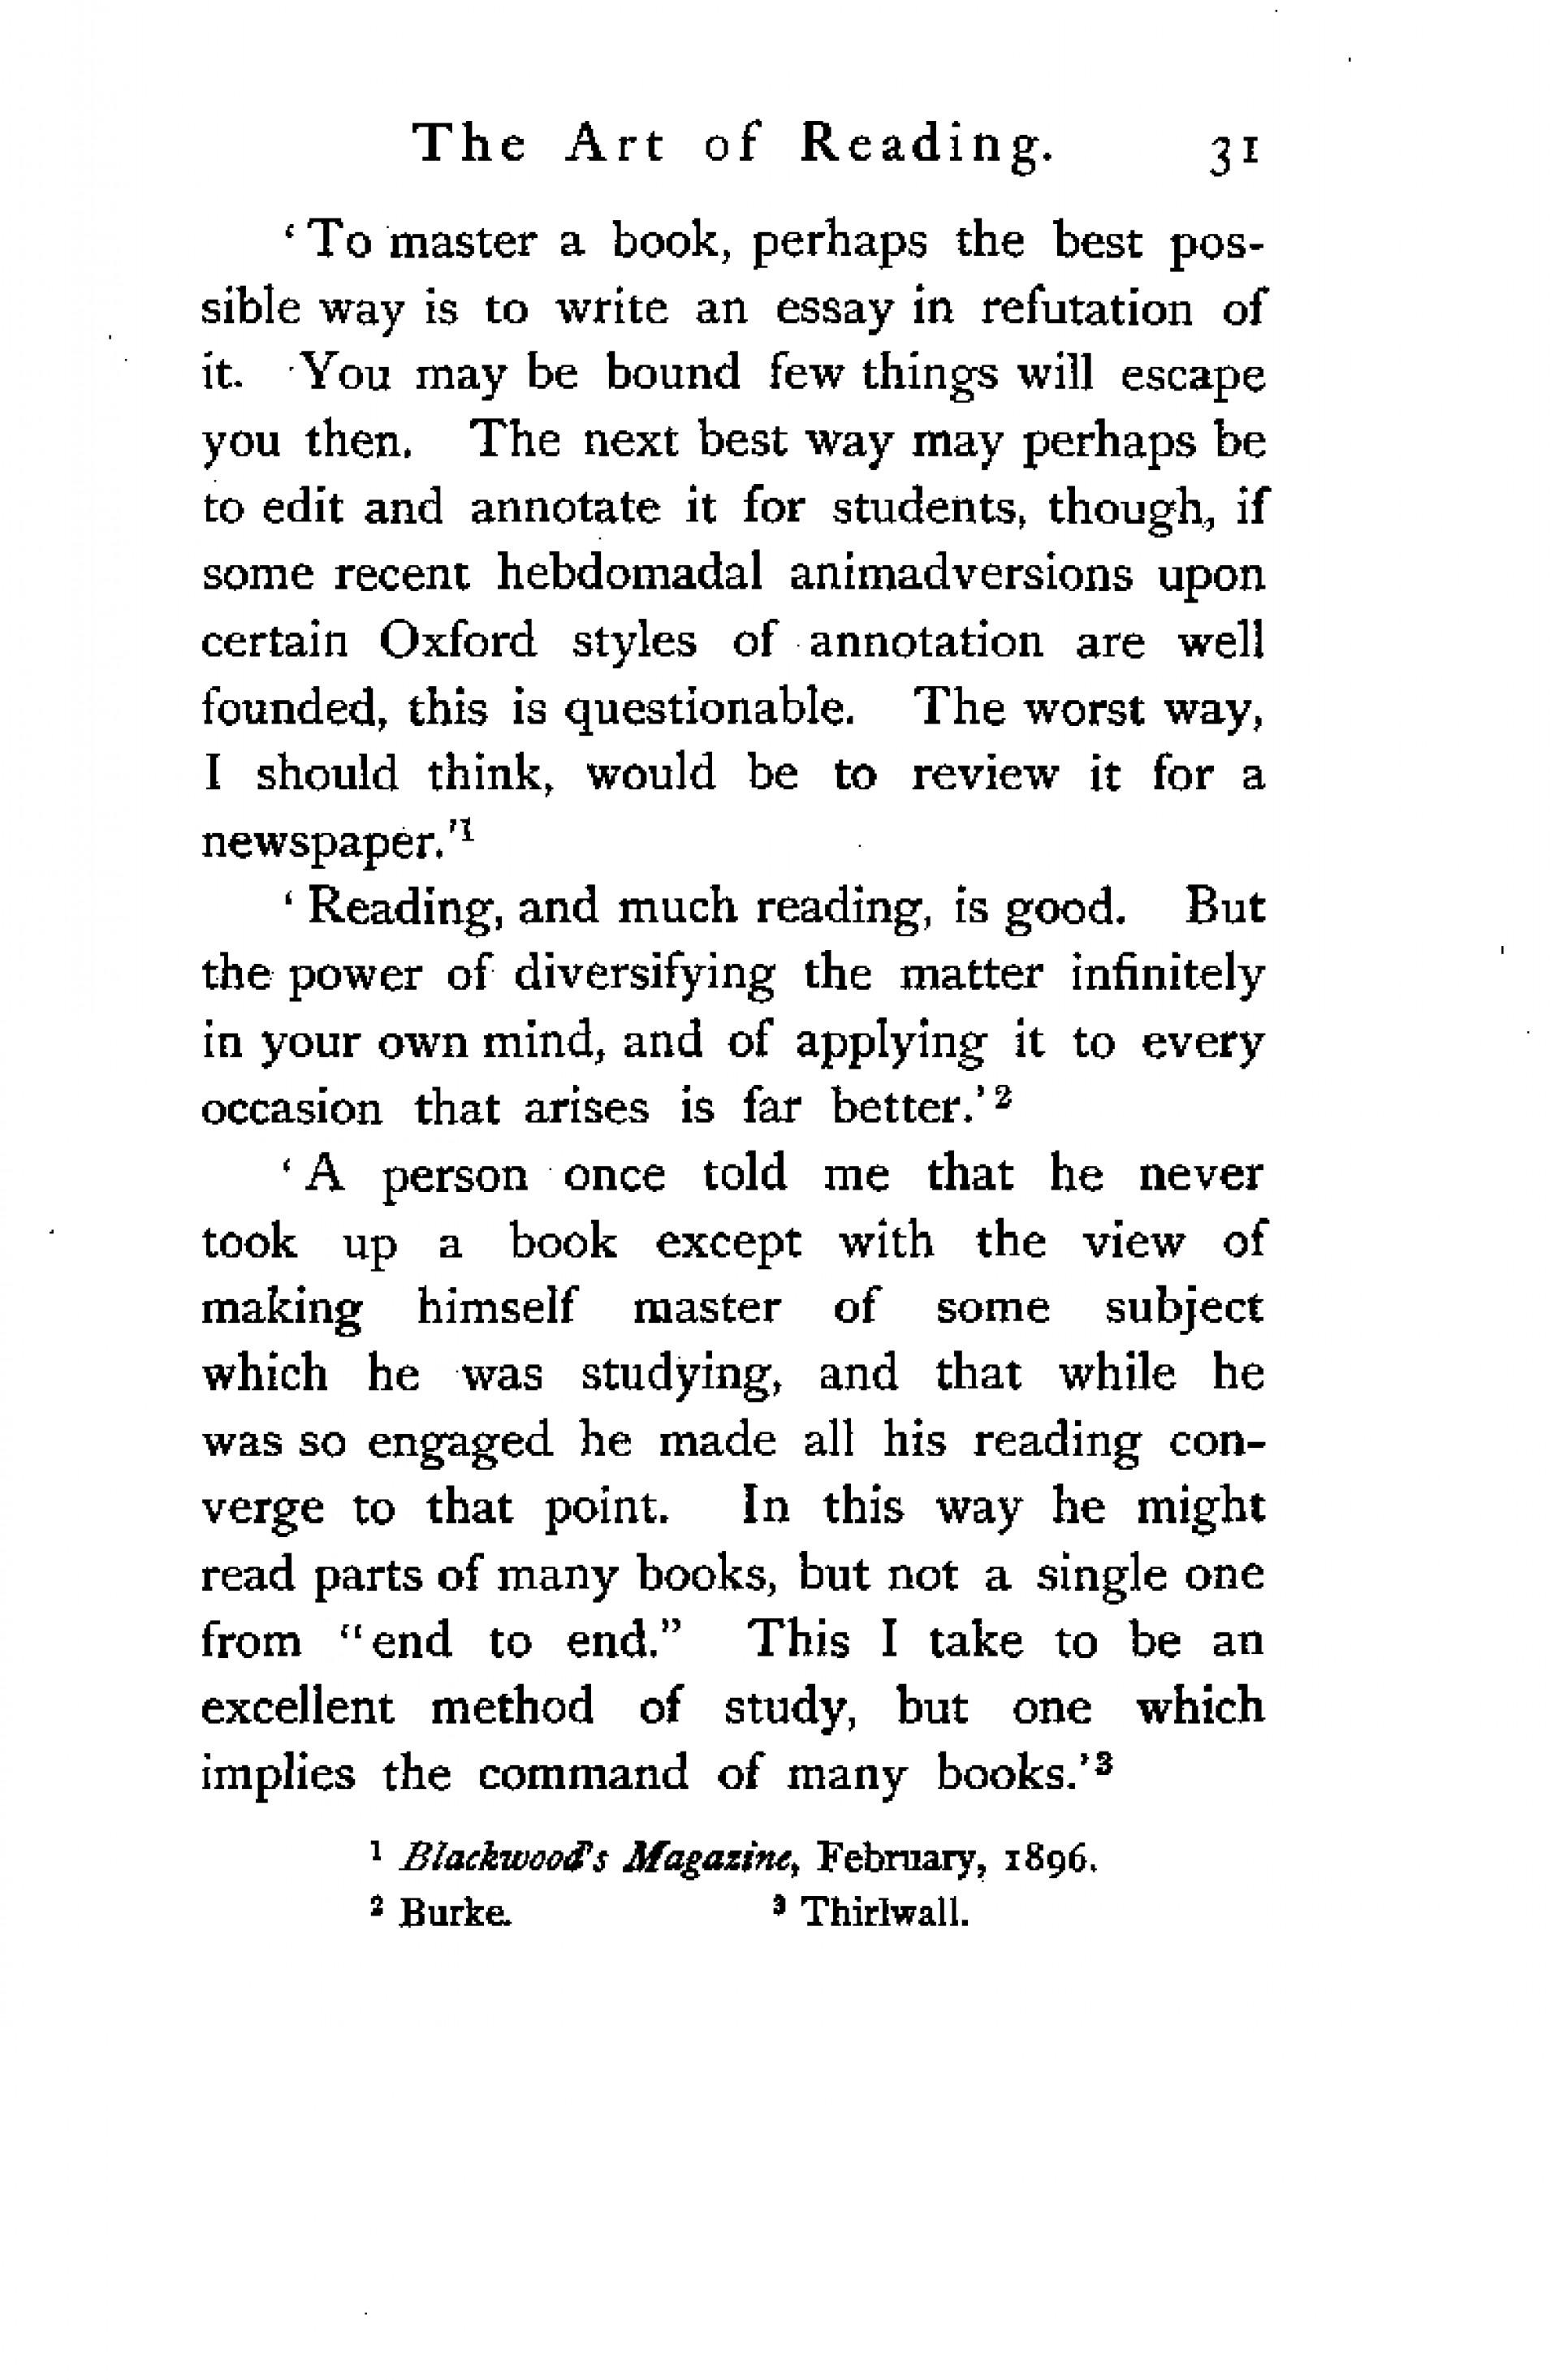 002 My Best Friend Essay Marvelous For Class 2 In Hindi 6 Short Marathi 1920